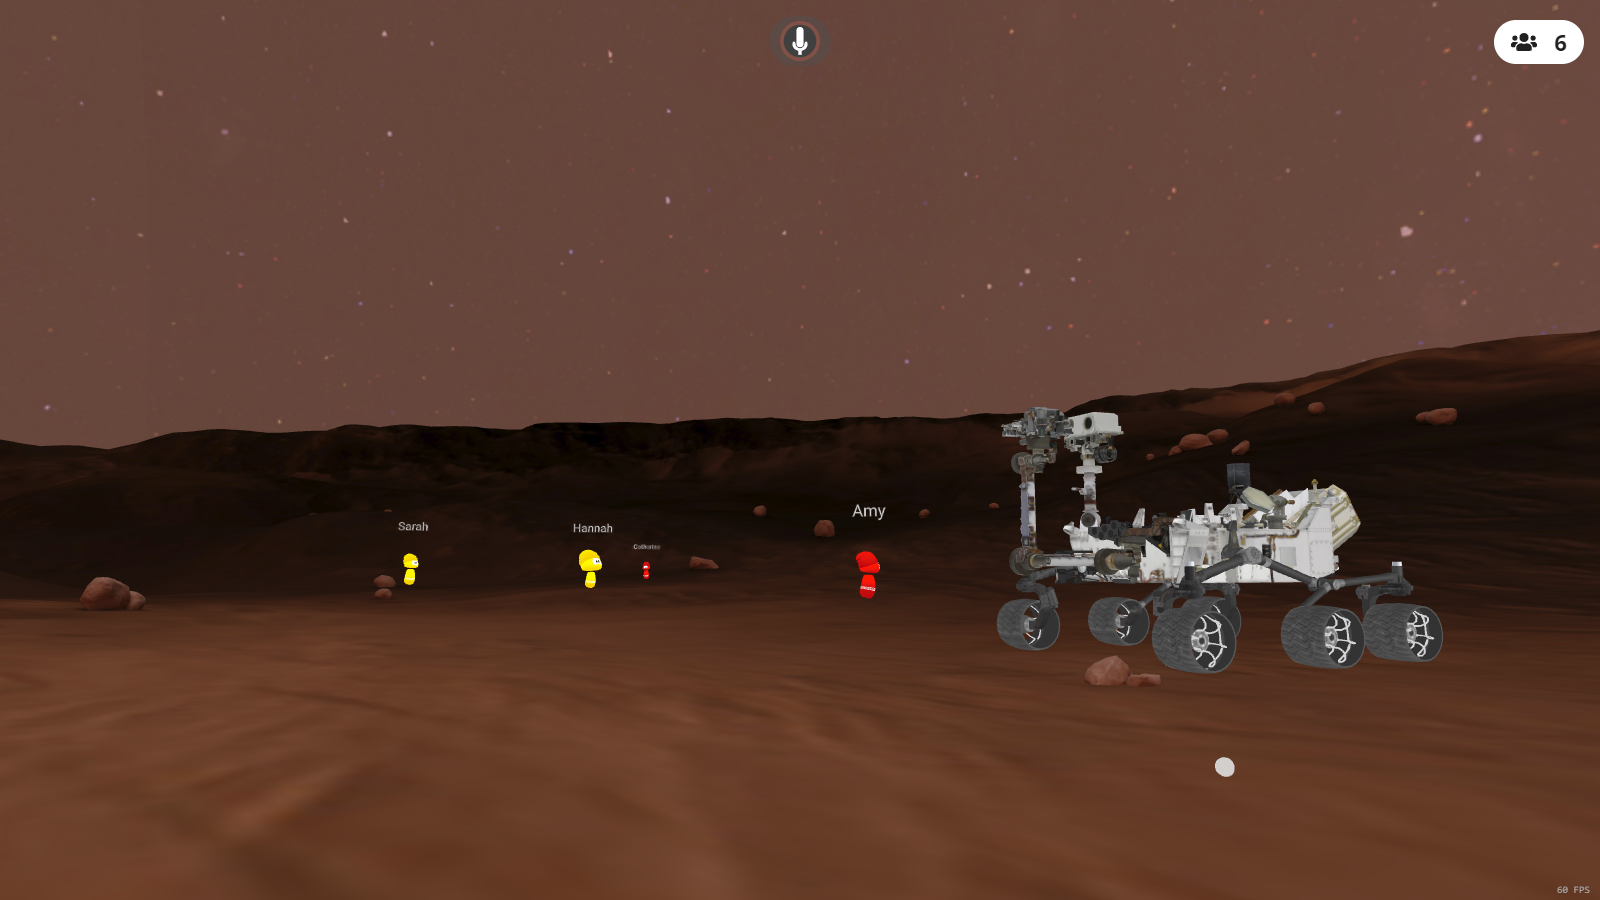 mars rover 3d model in vr image